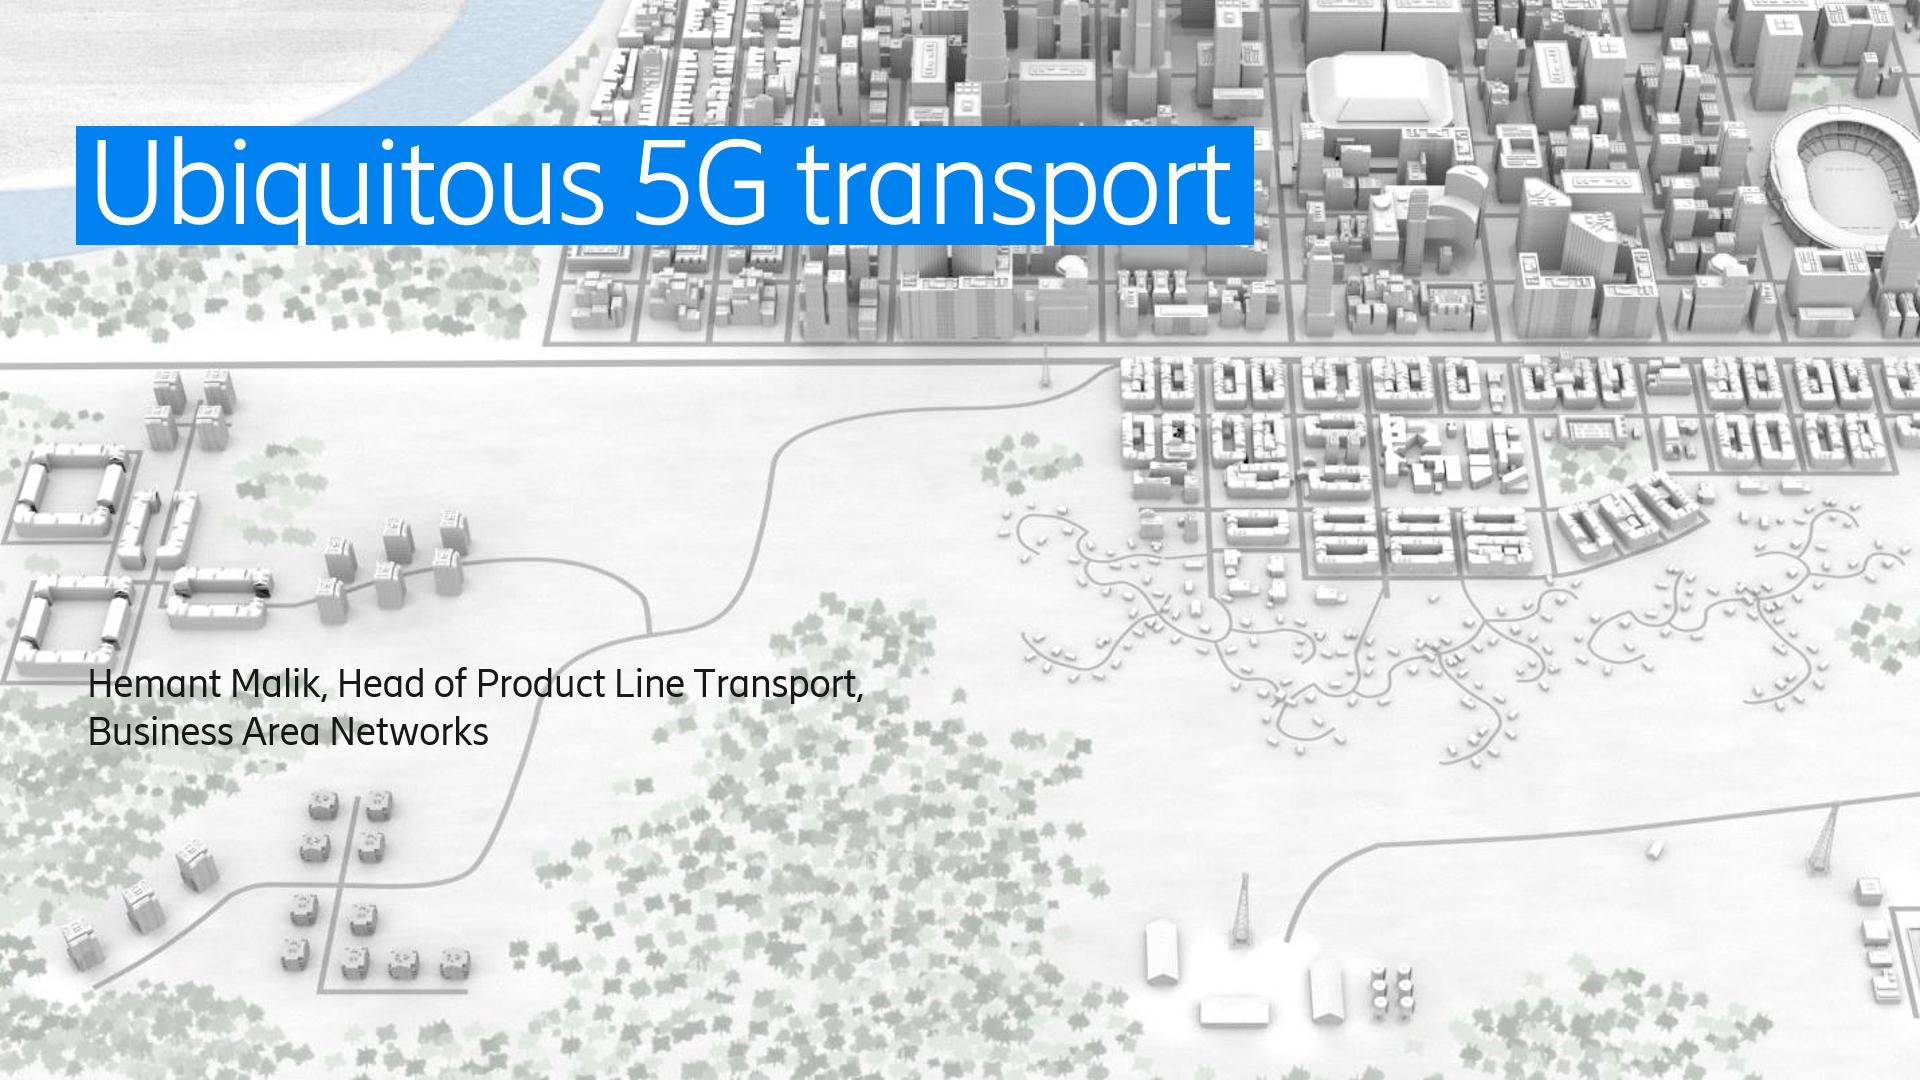 Ubiquitous 5G Transport